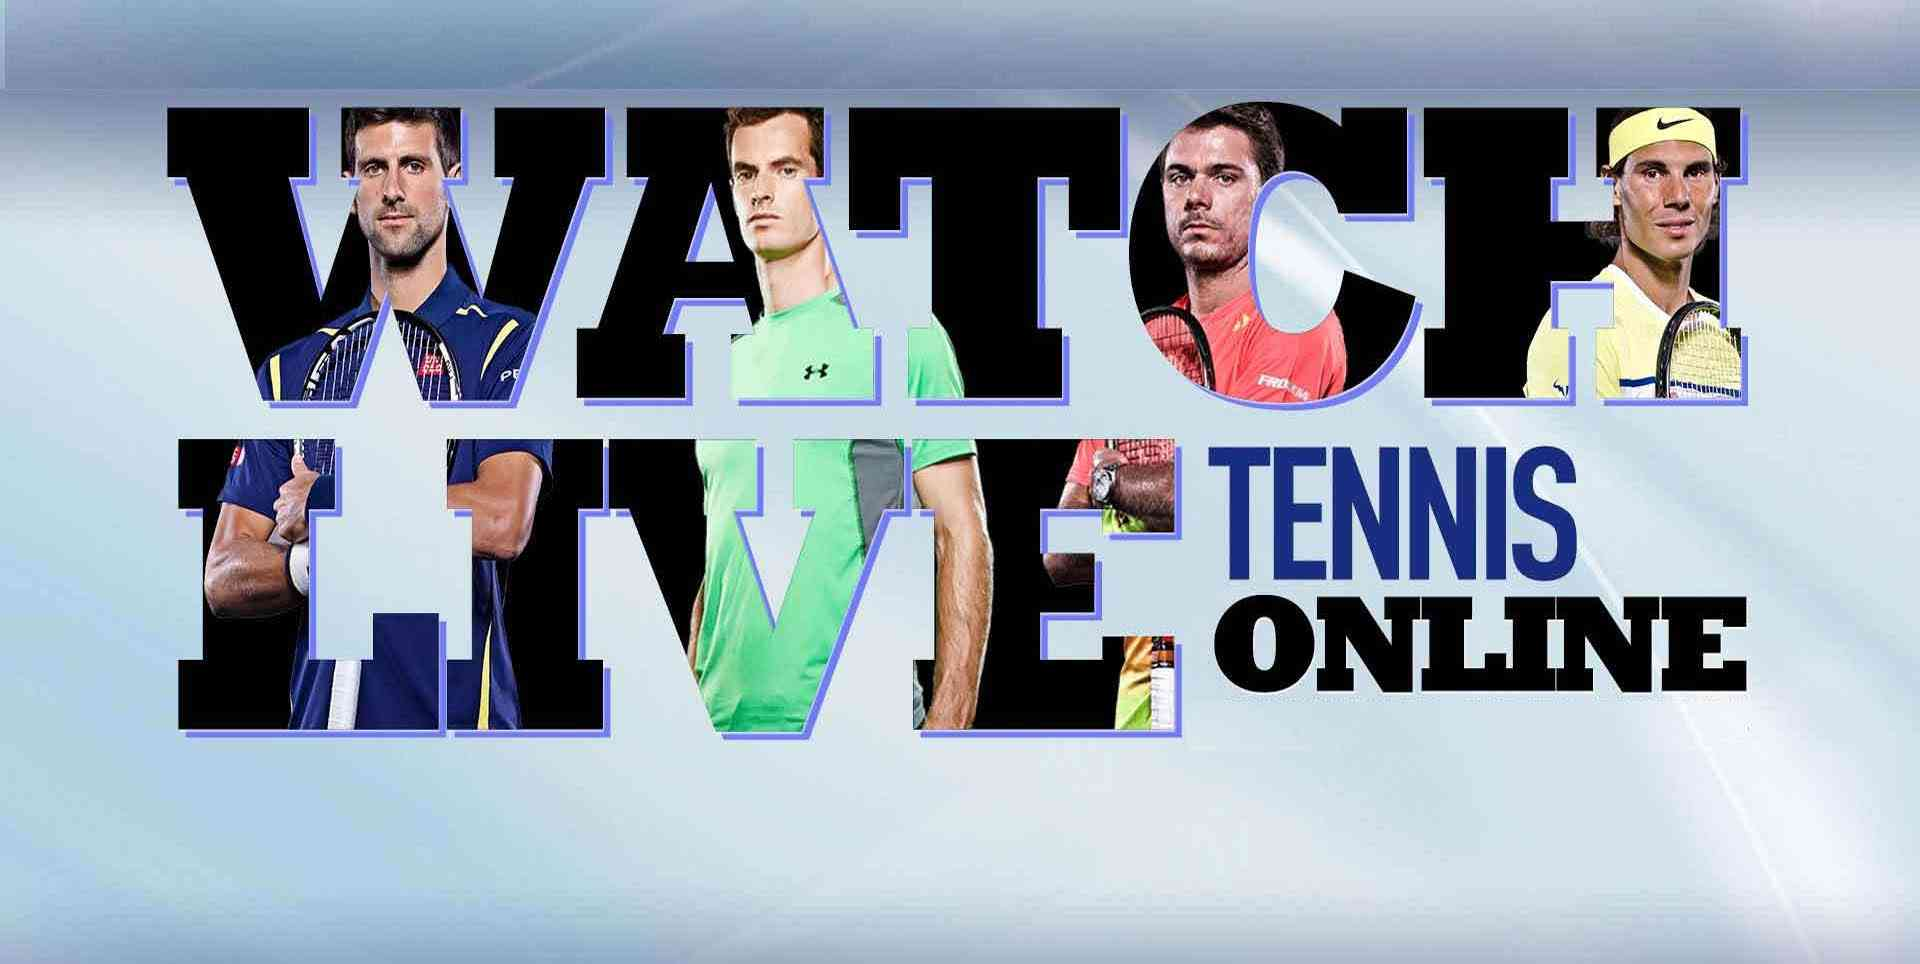 Watch L. Kubot | R. Lindstedt vs E. Butorac | R. Klaasen Australian Open 2014 Online